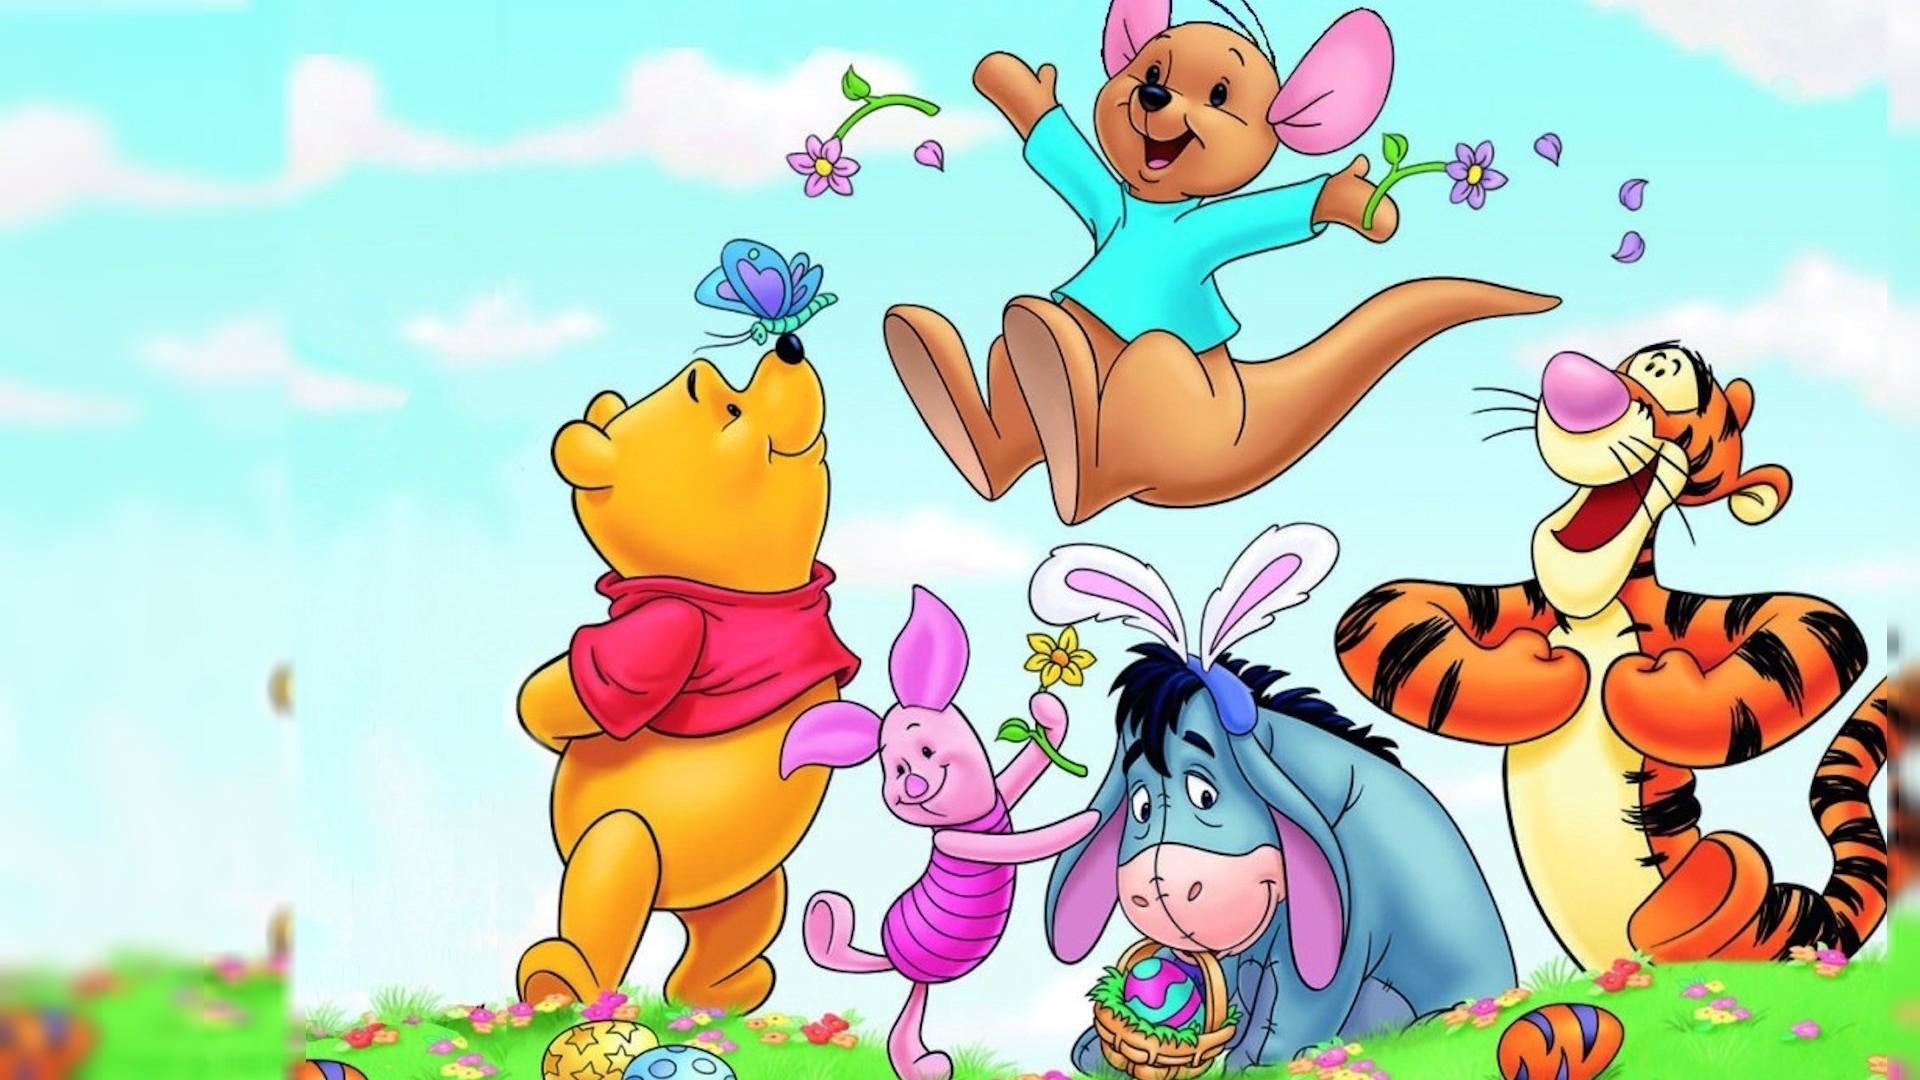 Winnie The Pooh Wallpaper Desktop (3)